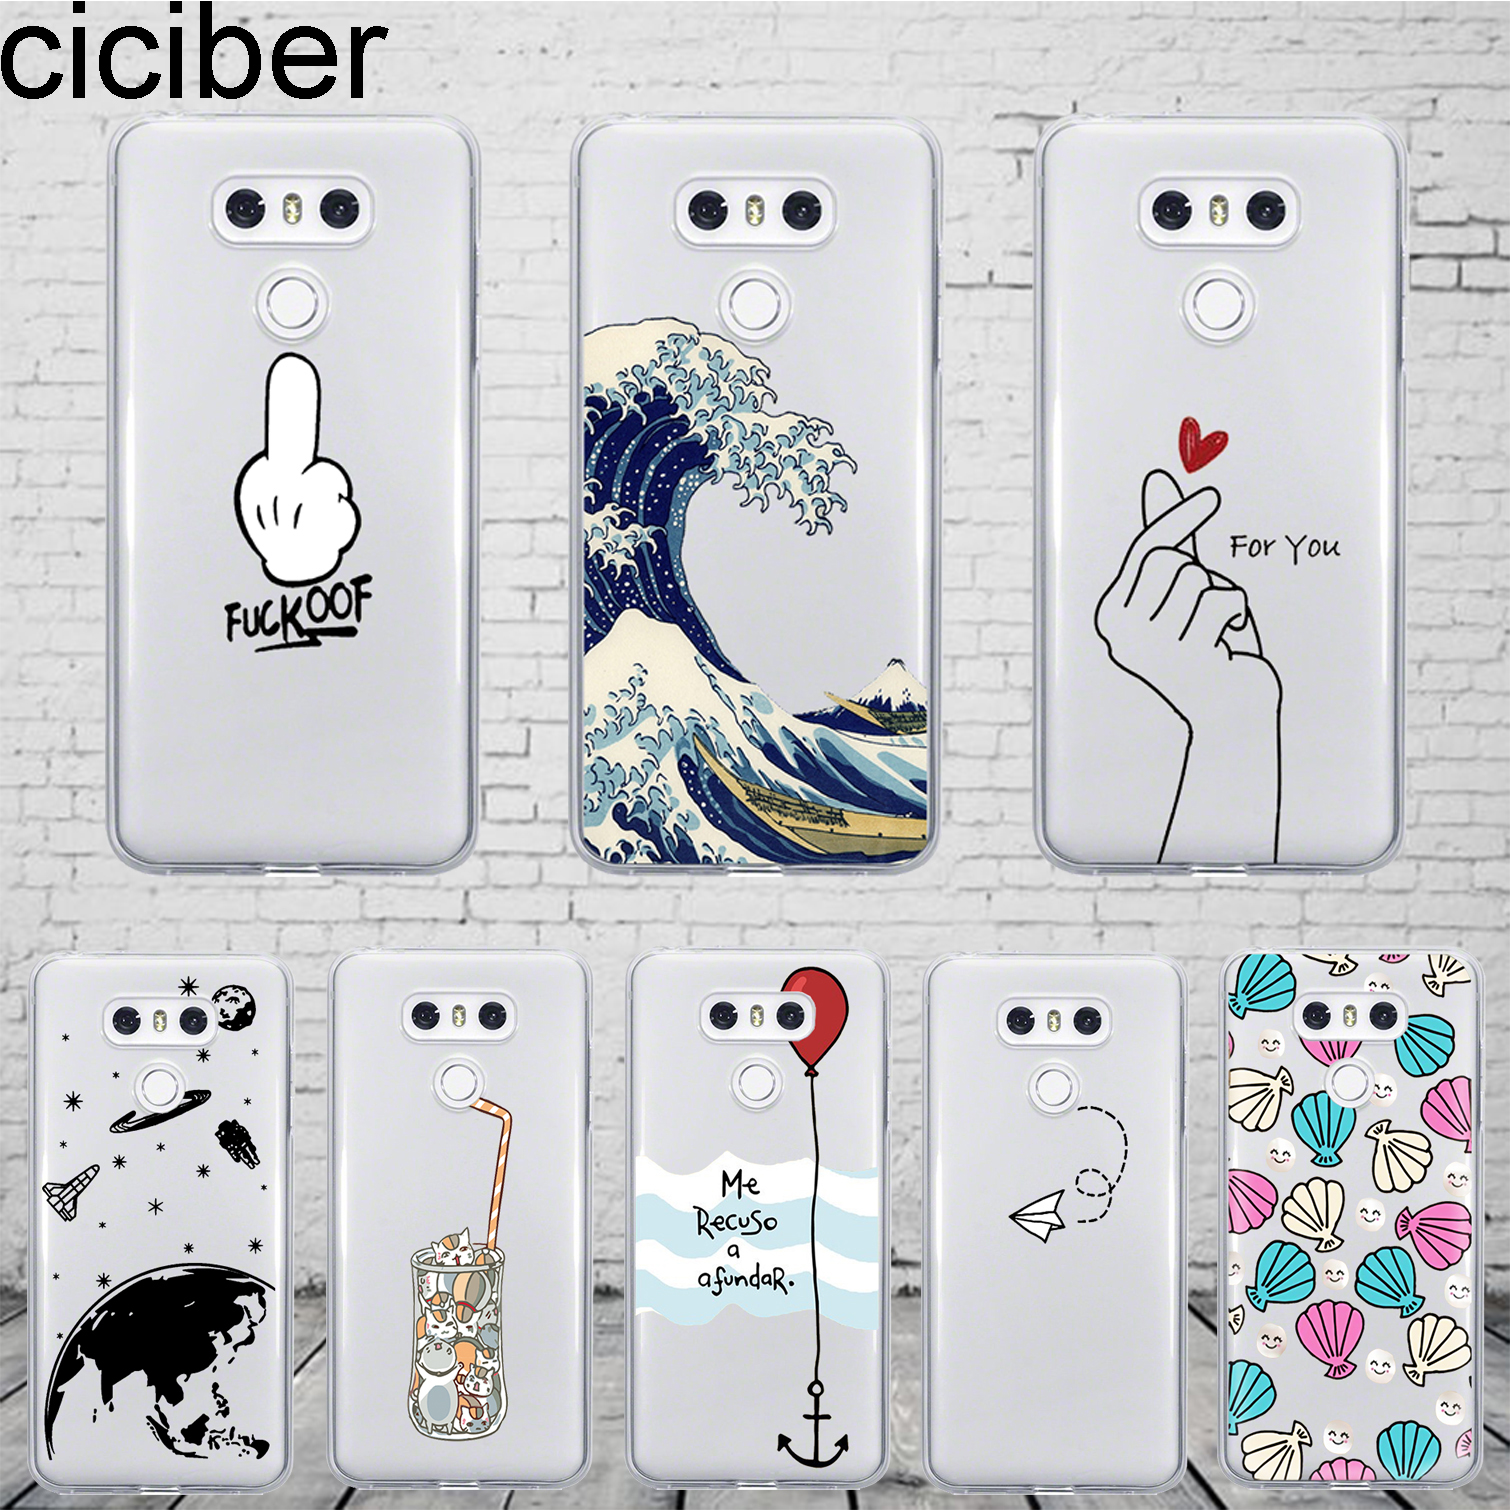 Balloon Finger Space For LG G7 G6 G5 G4 V40 V35 V30 V20 THINQ Phone Case For LG K8 K10 K4 2017 2018 K9 K11 Plus Fundas